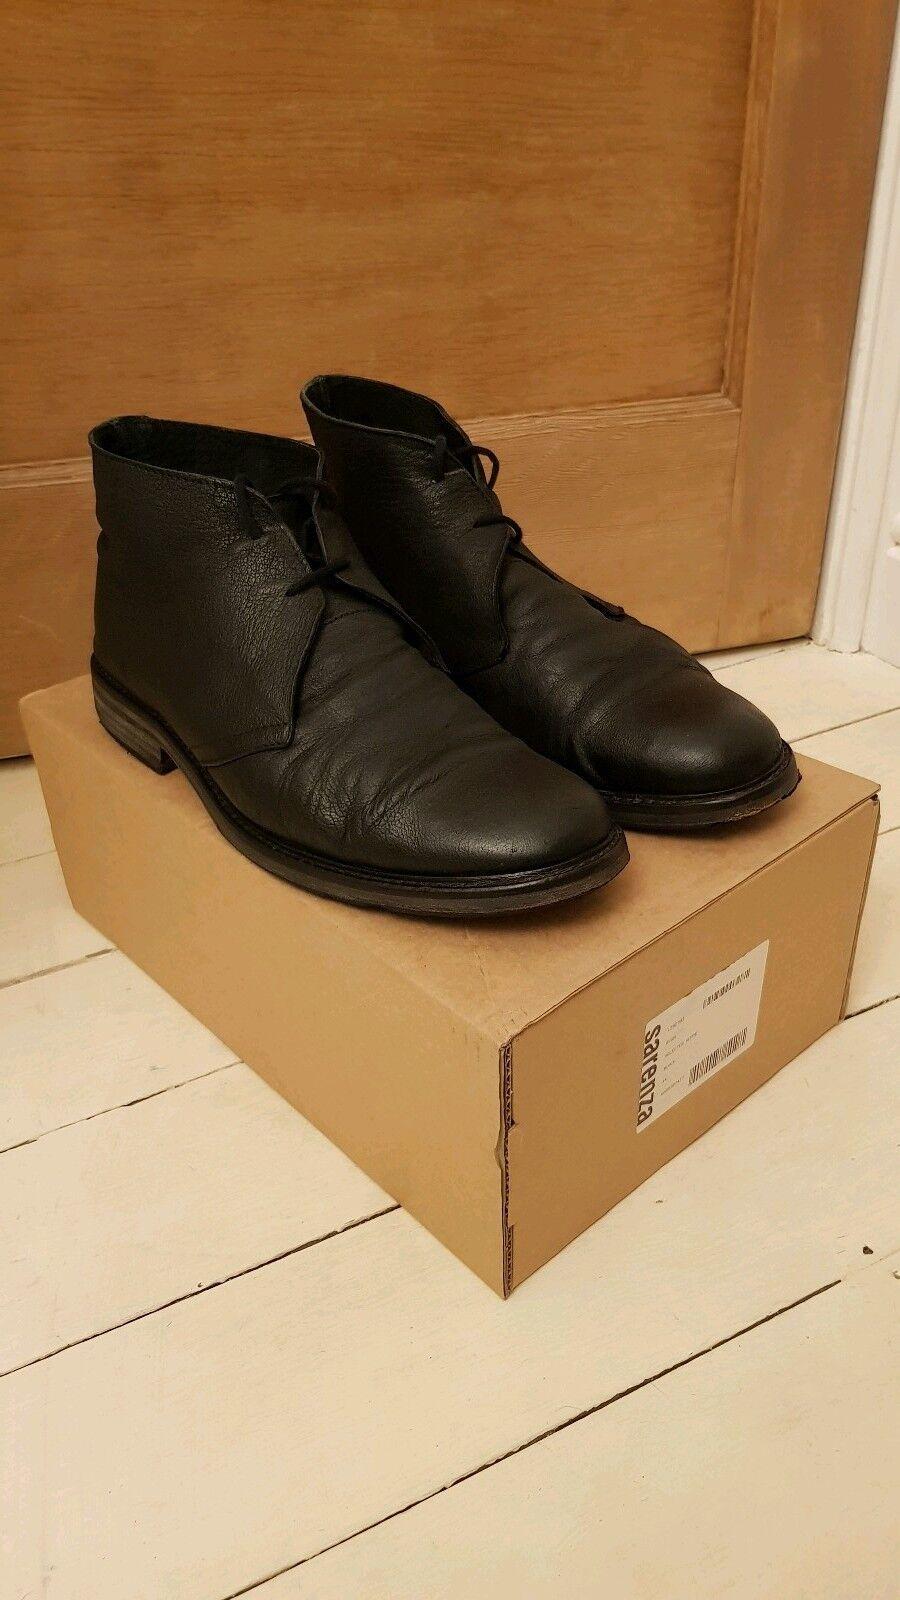 Selected Homme Ryan Lacets Bottes Chaussure Noir UK 10